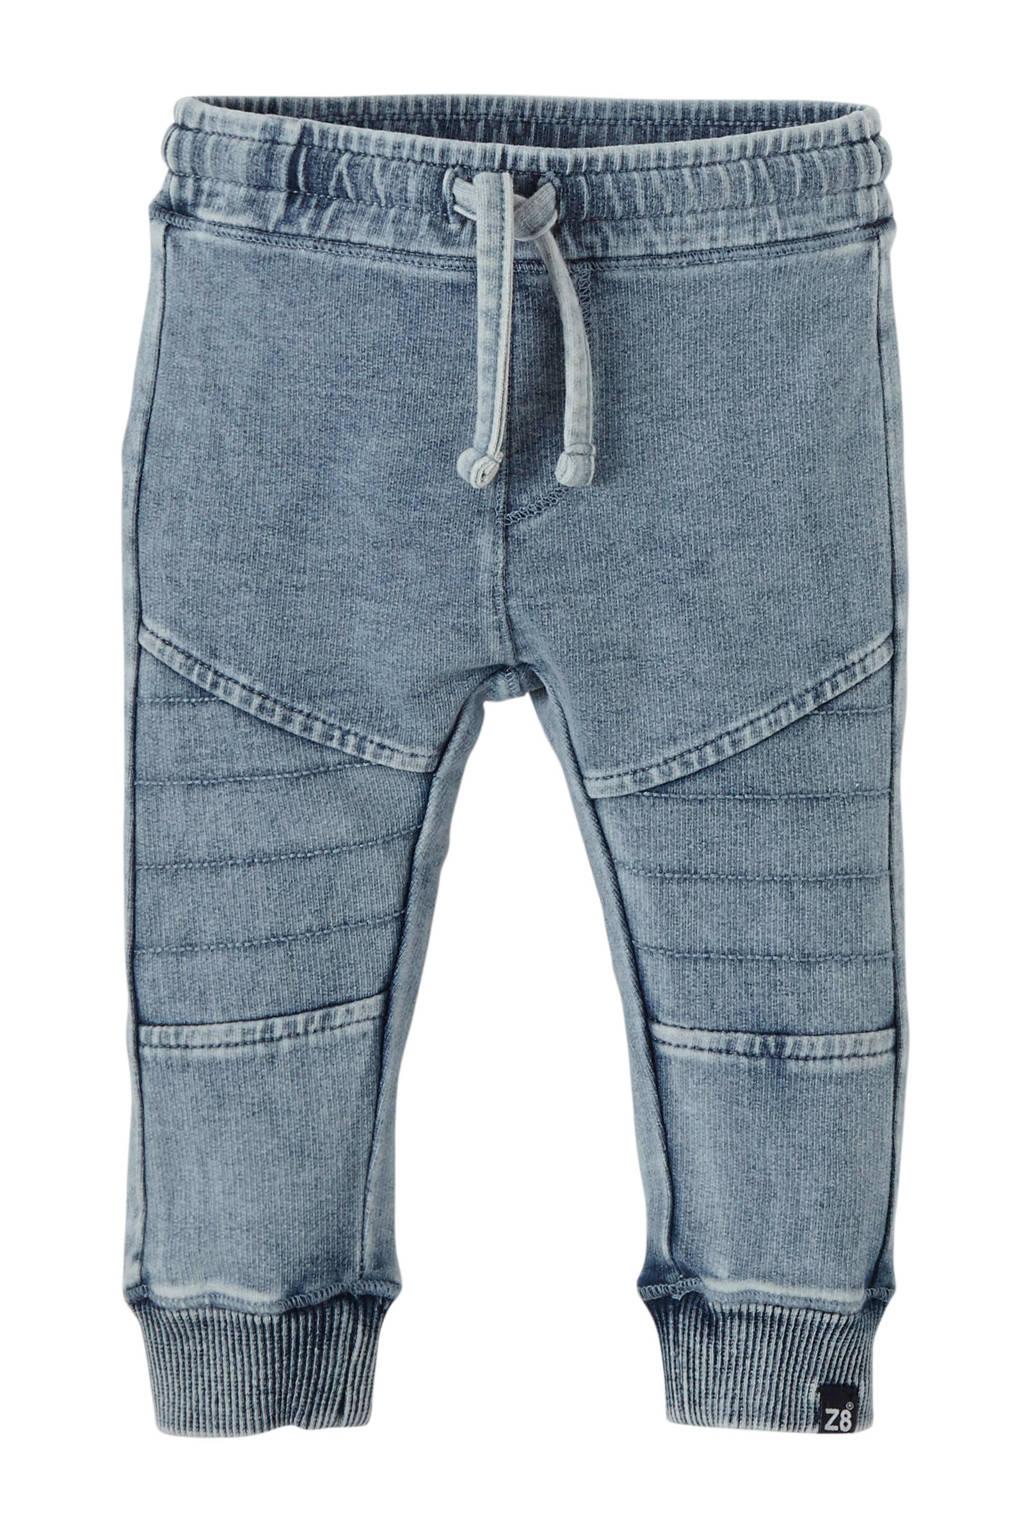 Z8 loose fit jeans California, Indigo